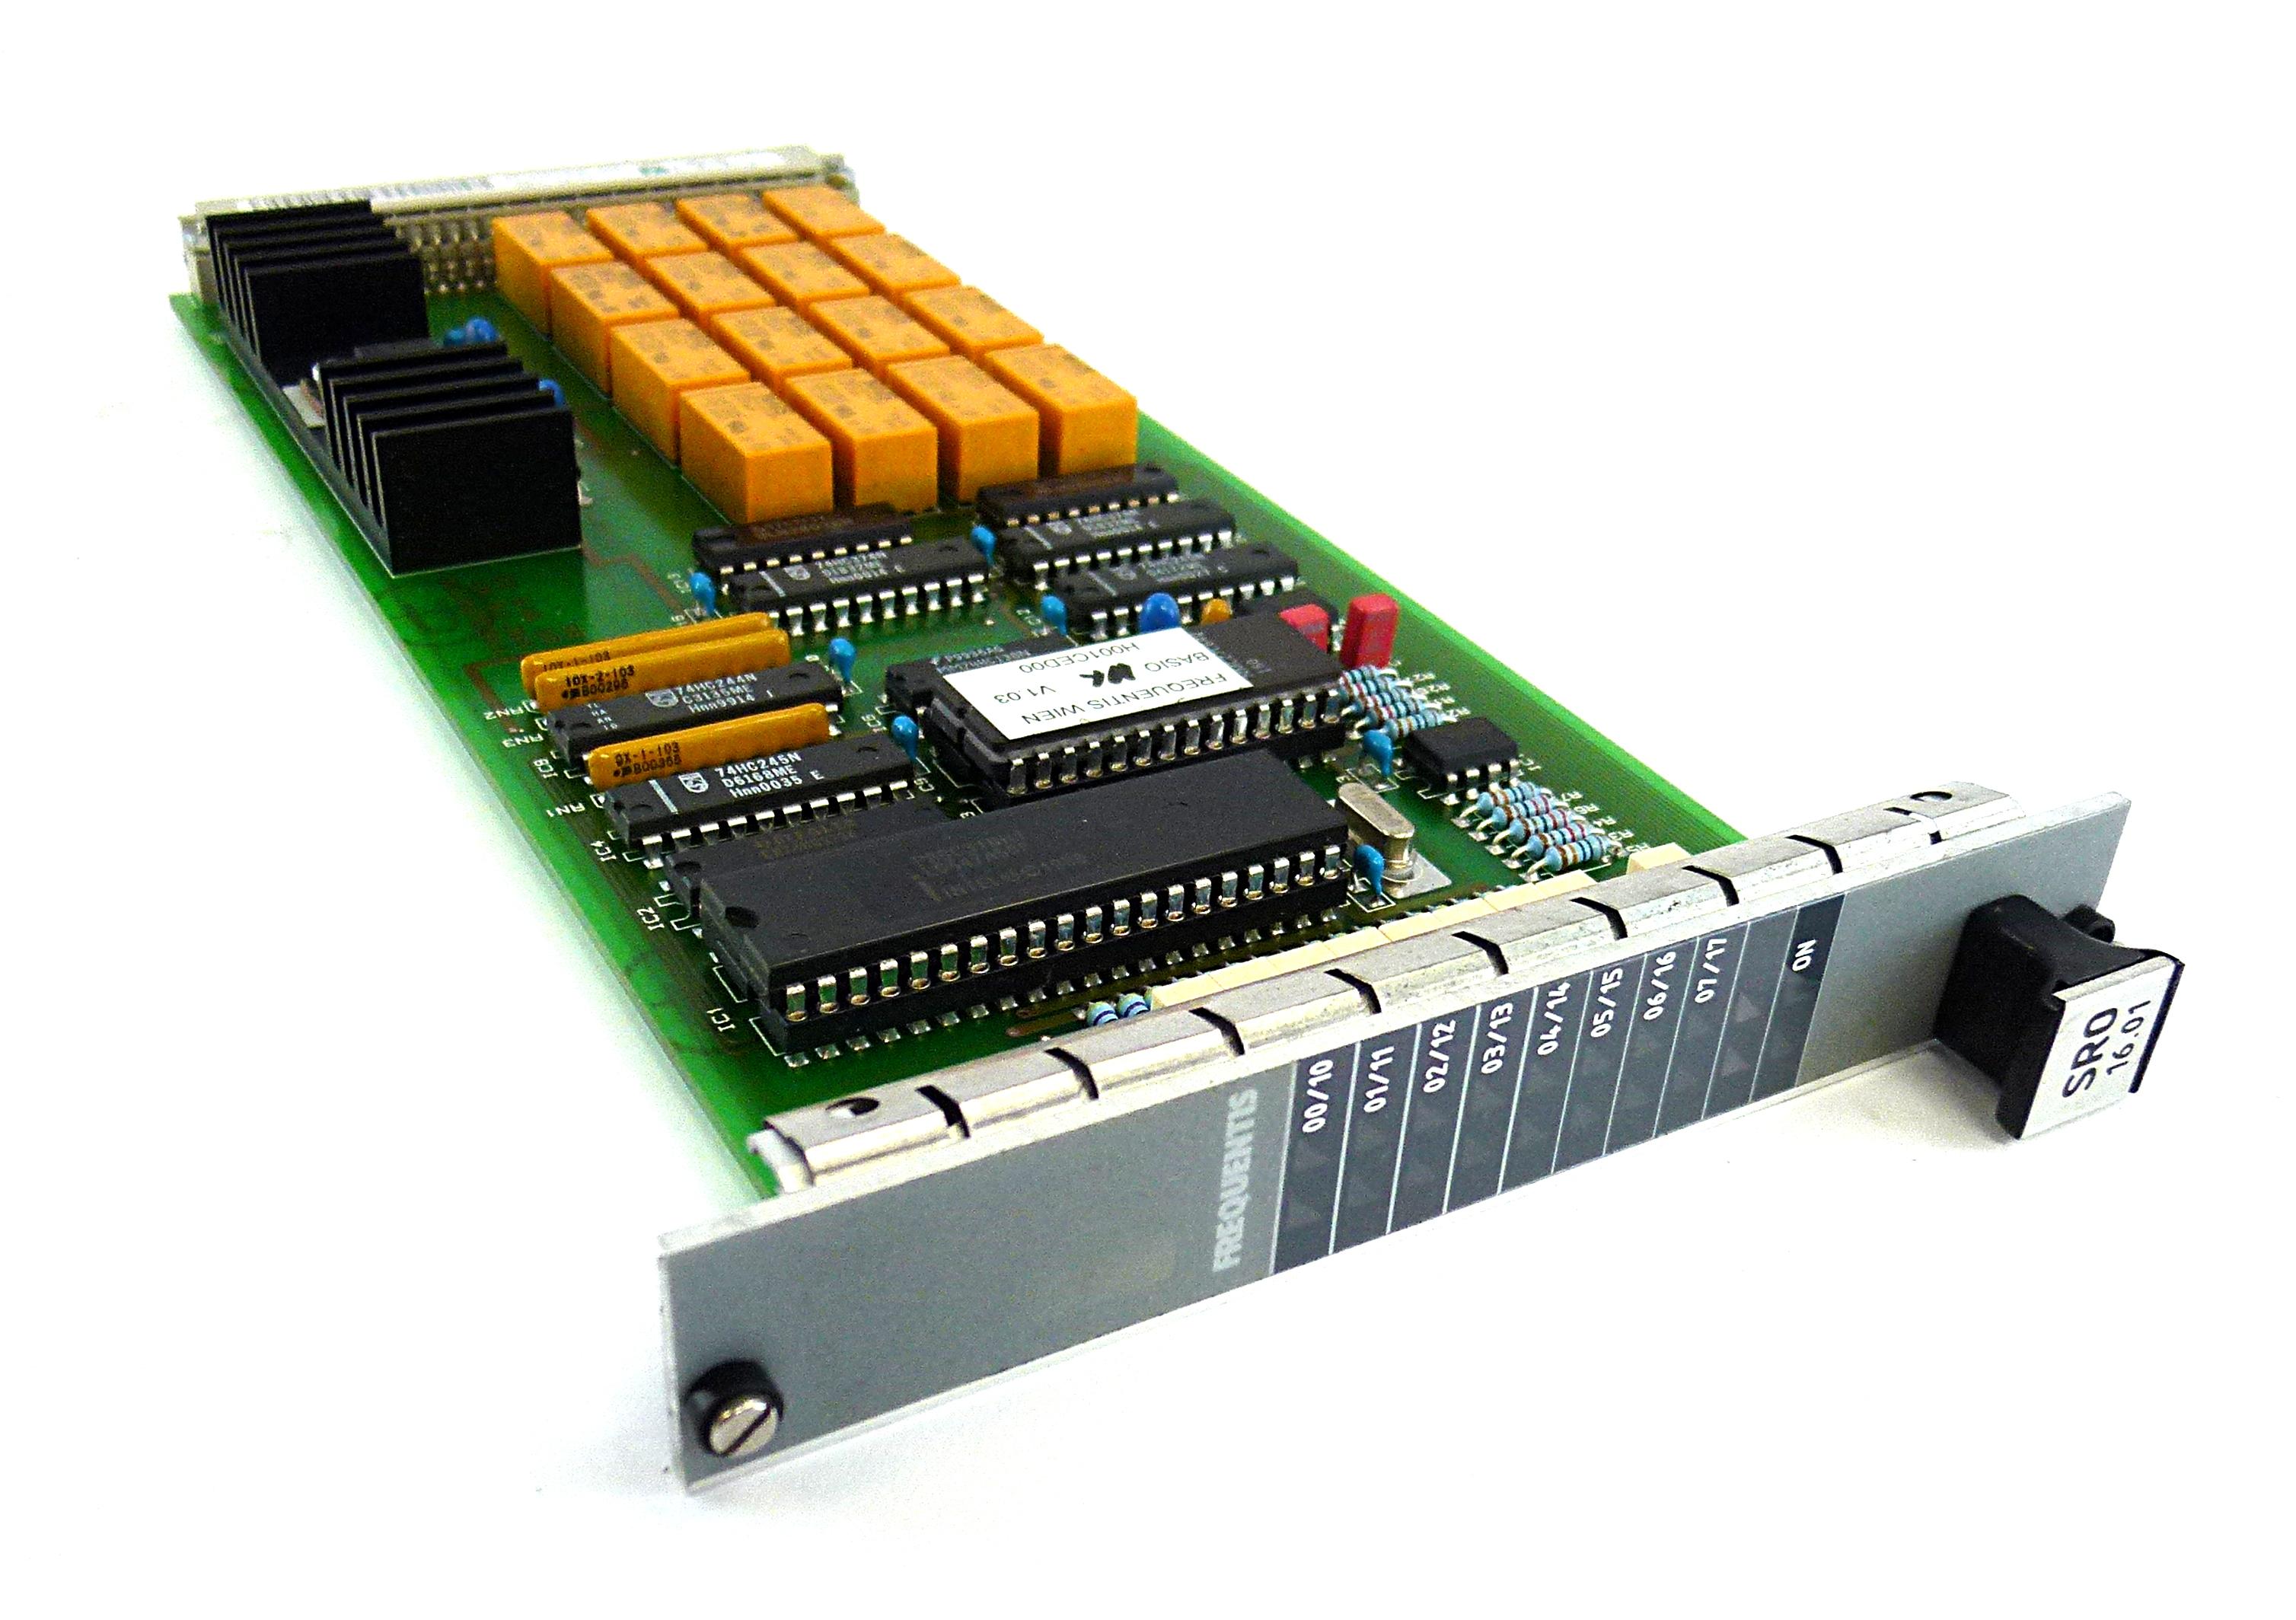 Frequentis SRO 16.01 BGT Data 706619 Communication Module